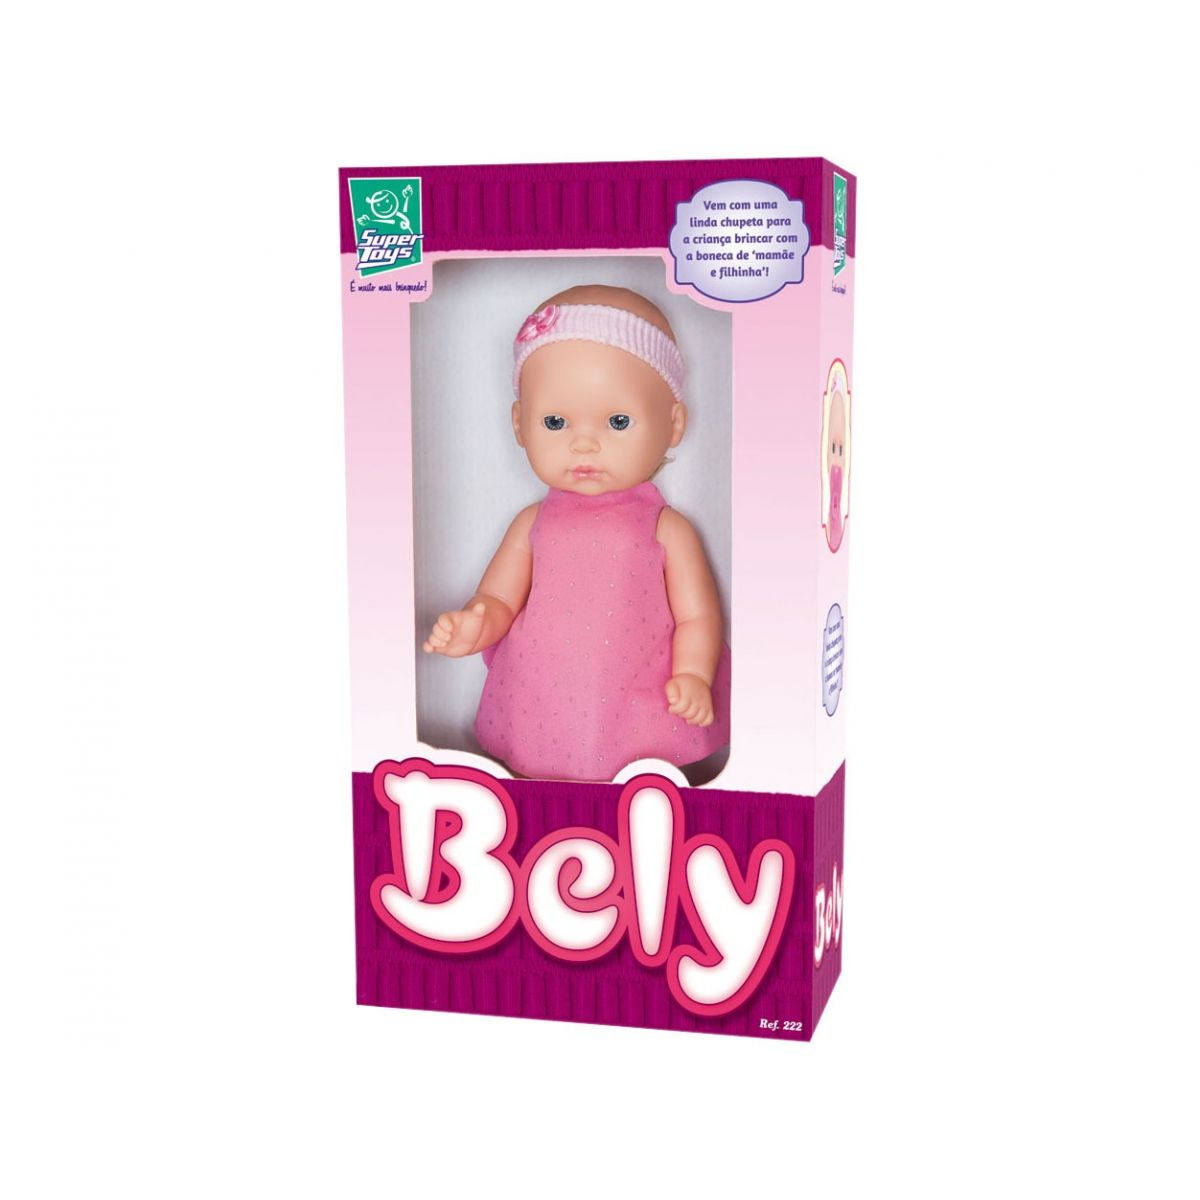 Boneca Bely Super Toys Ref. 222